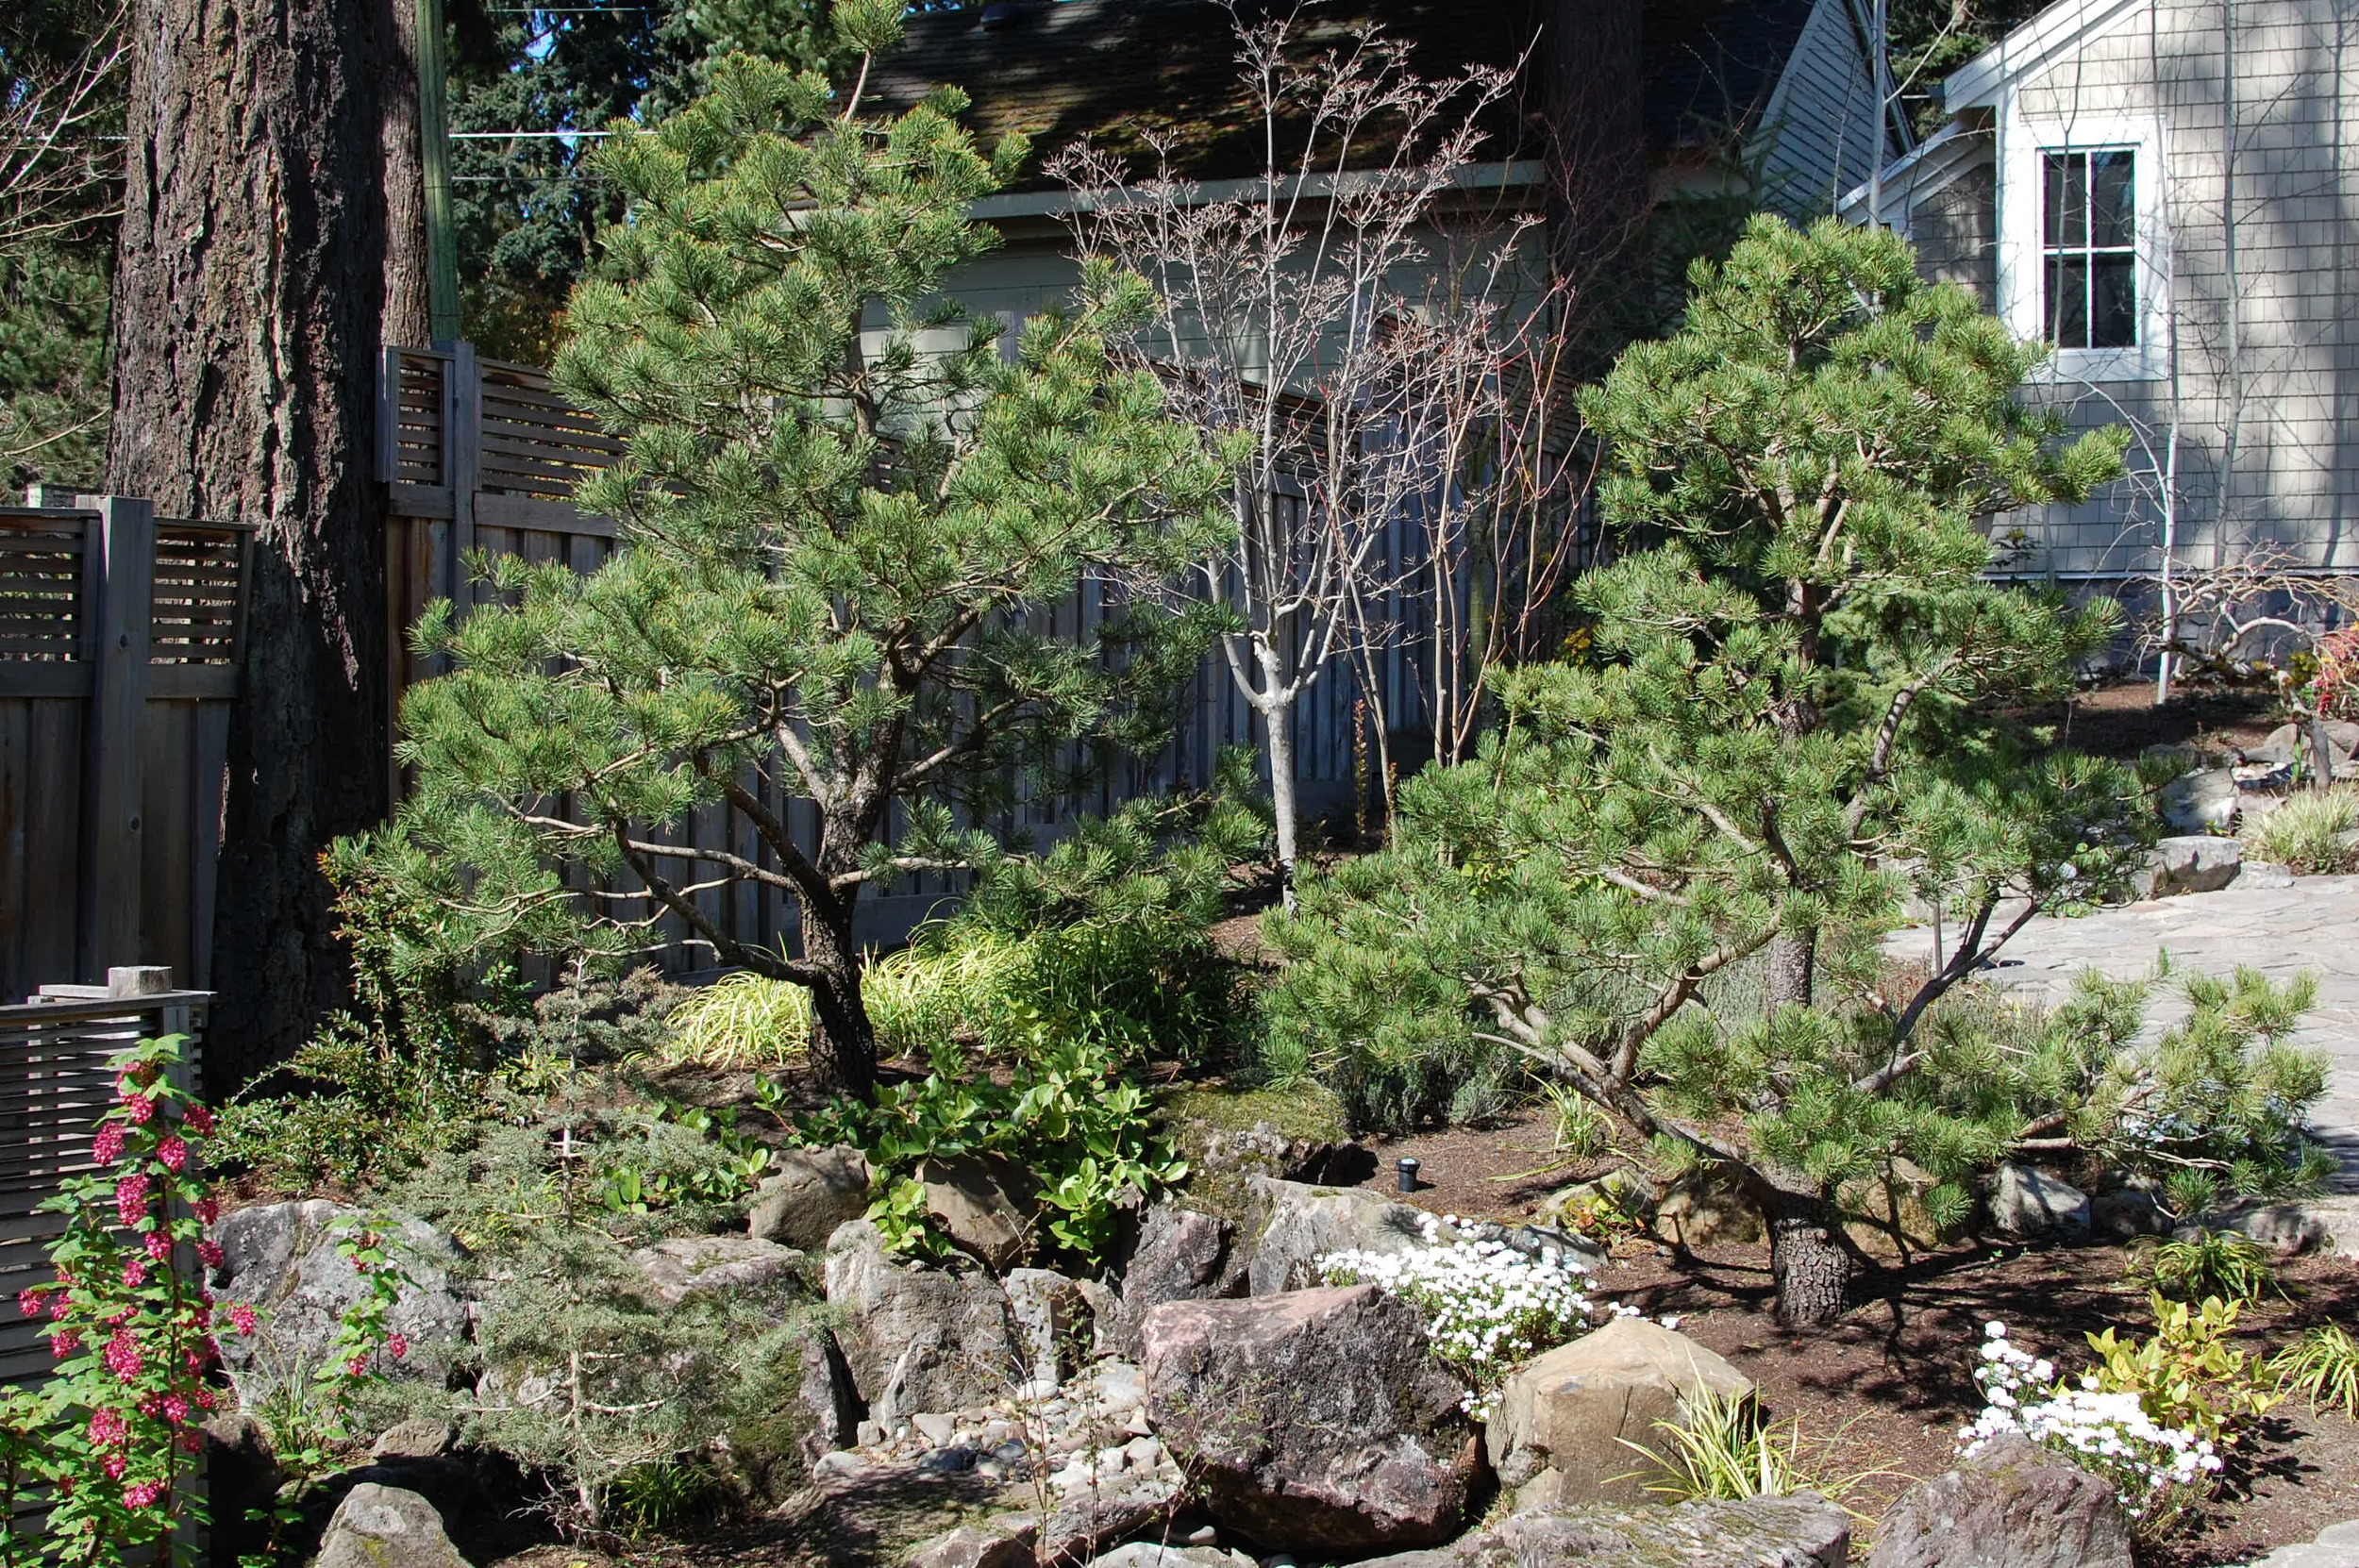 boulders-shore-pines.JPG